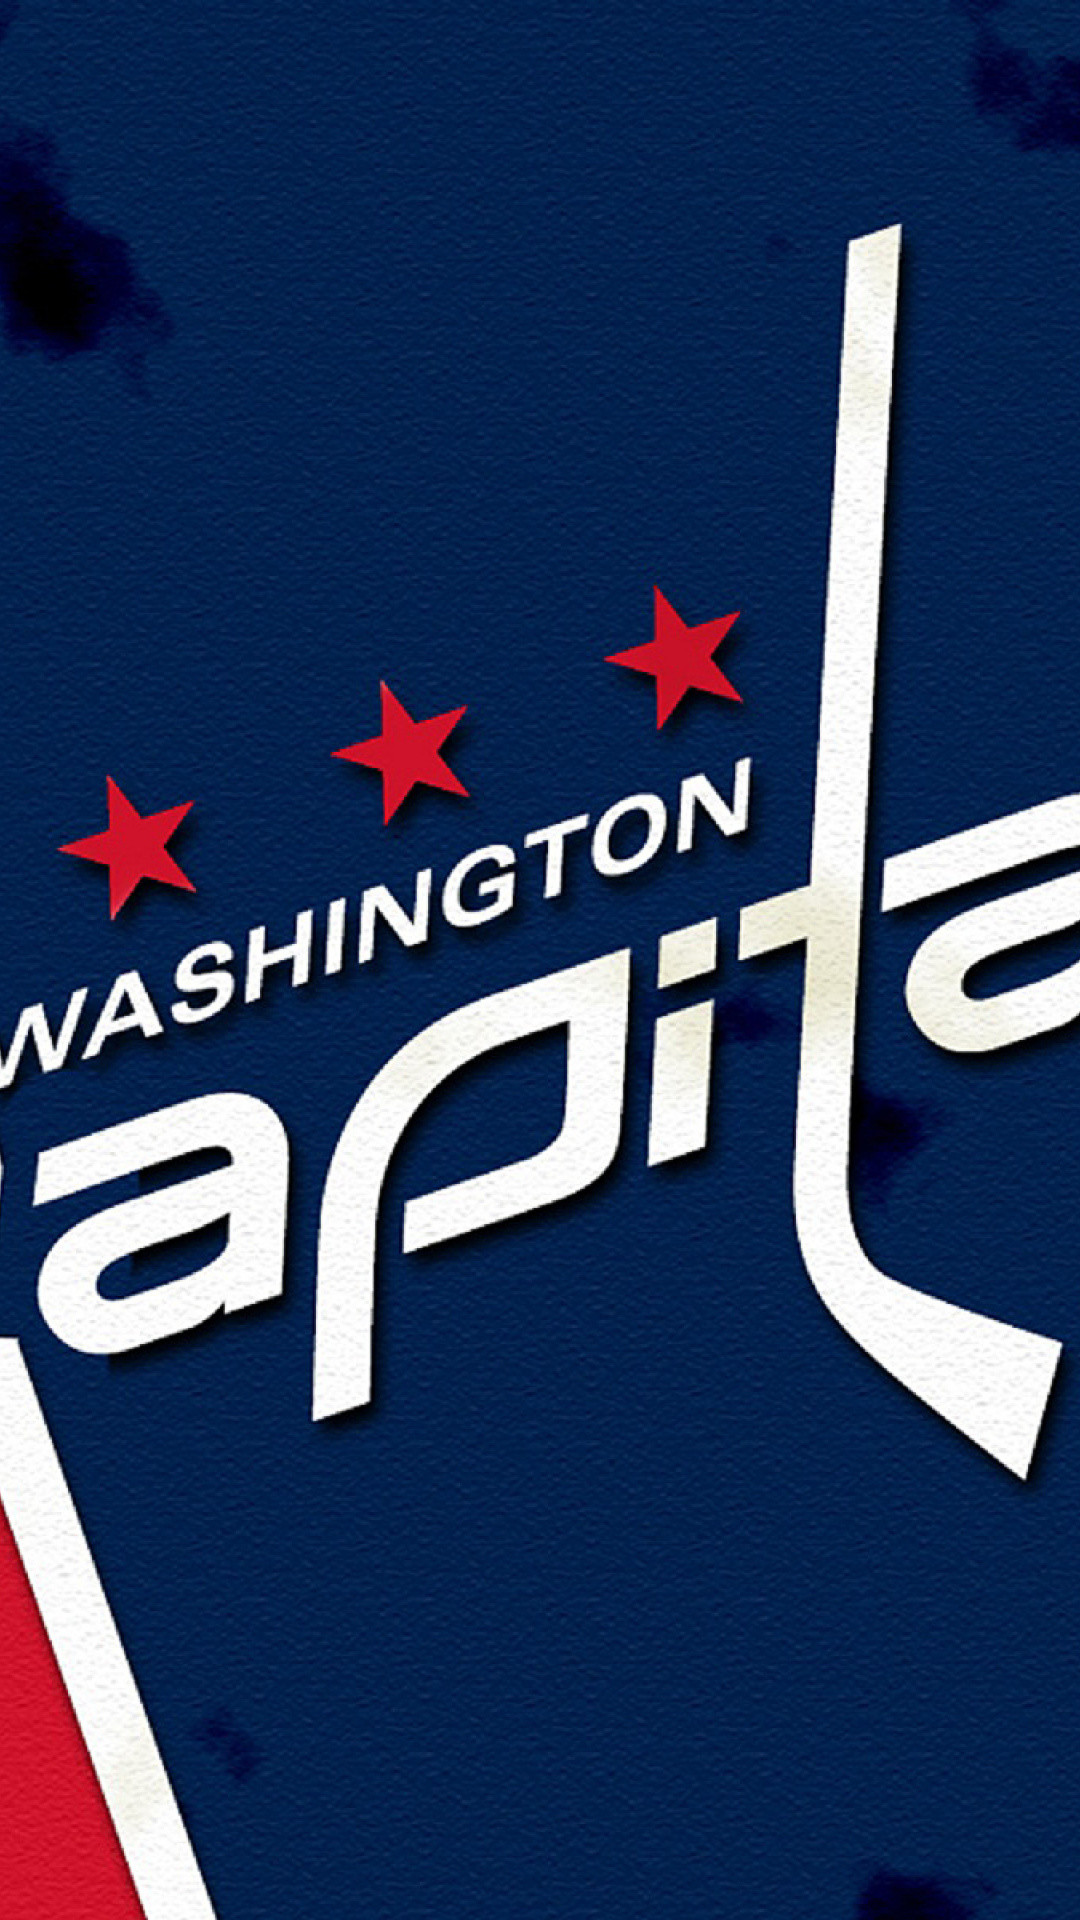 Washington Capitals NHL Wallpaper for iPhone 6 Plus